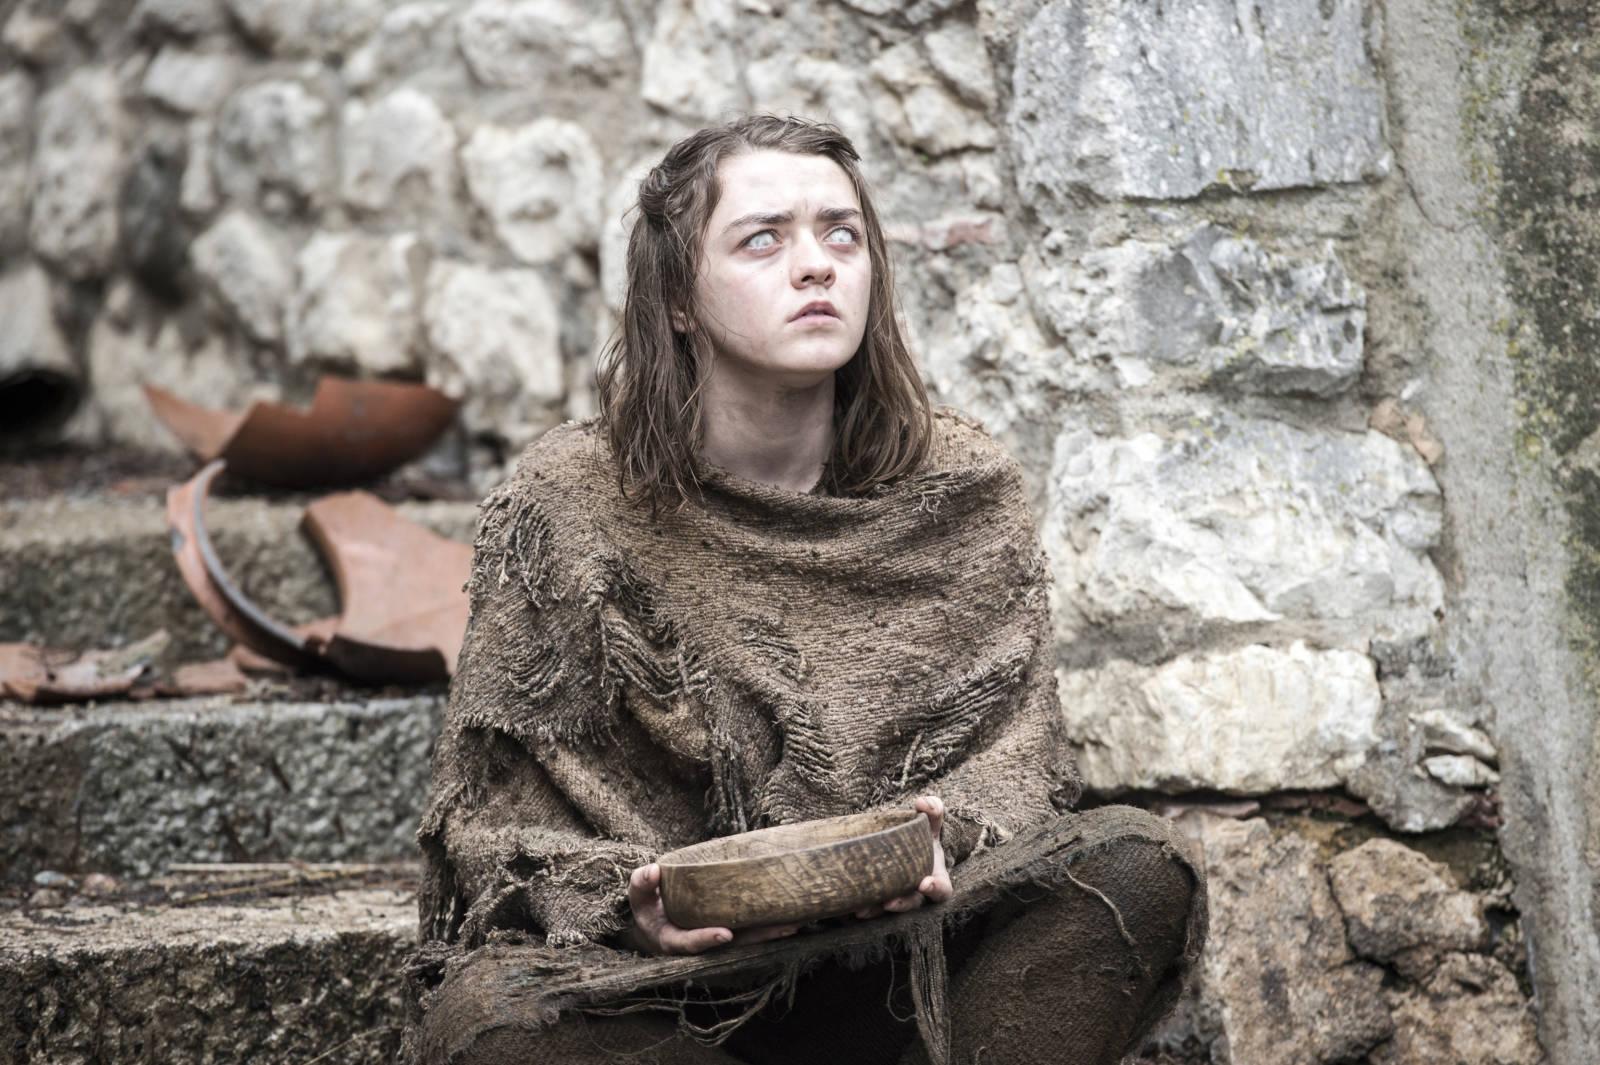 Game of Thrones Girona 2016©Macall B. Polay-HBO